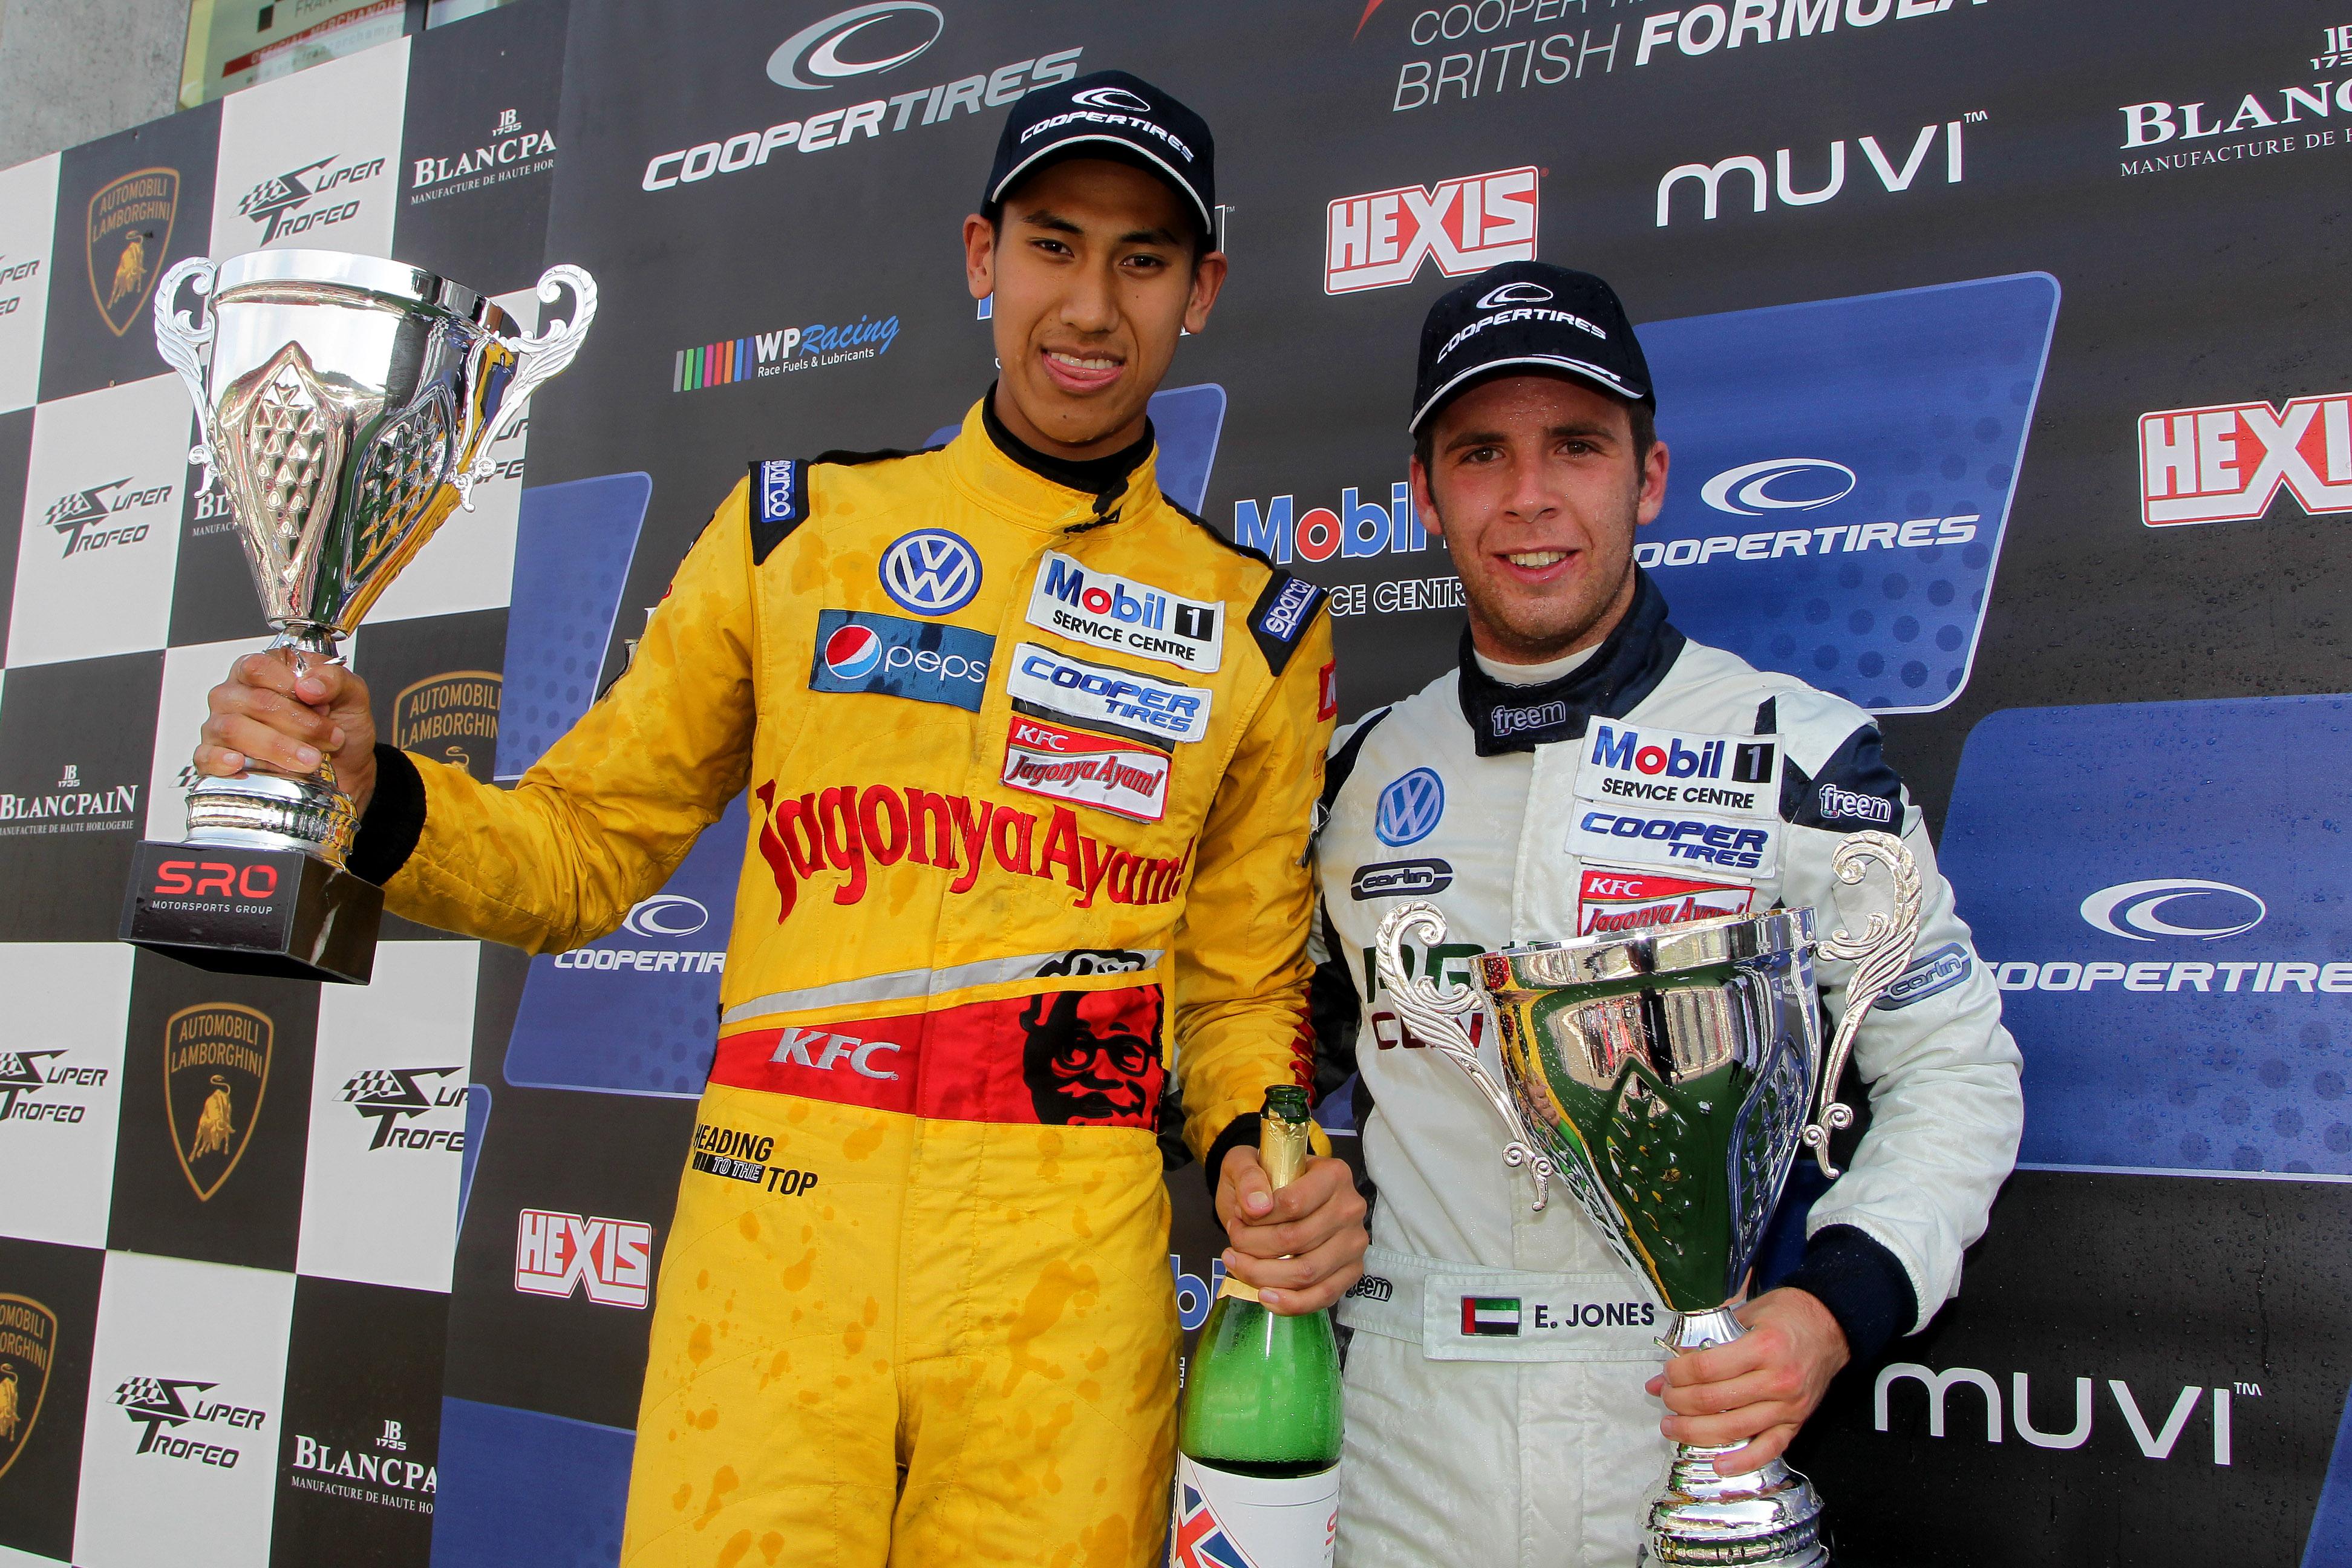 F3: Dubai's star driver Ed Jones makes it three wins on his race comeback at Spa